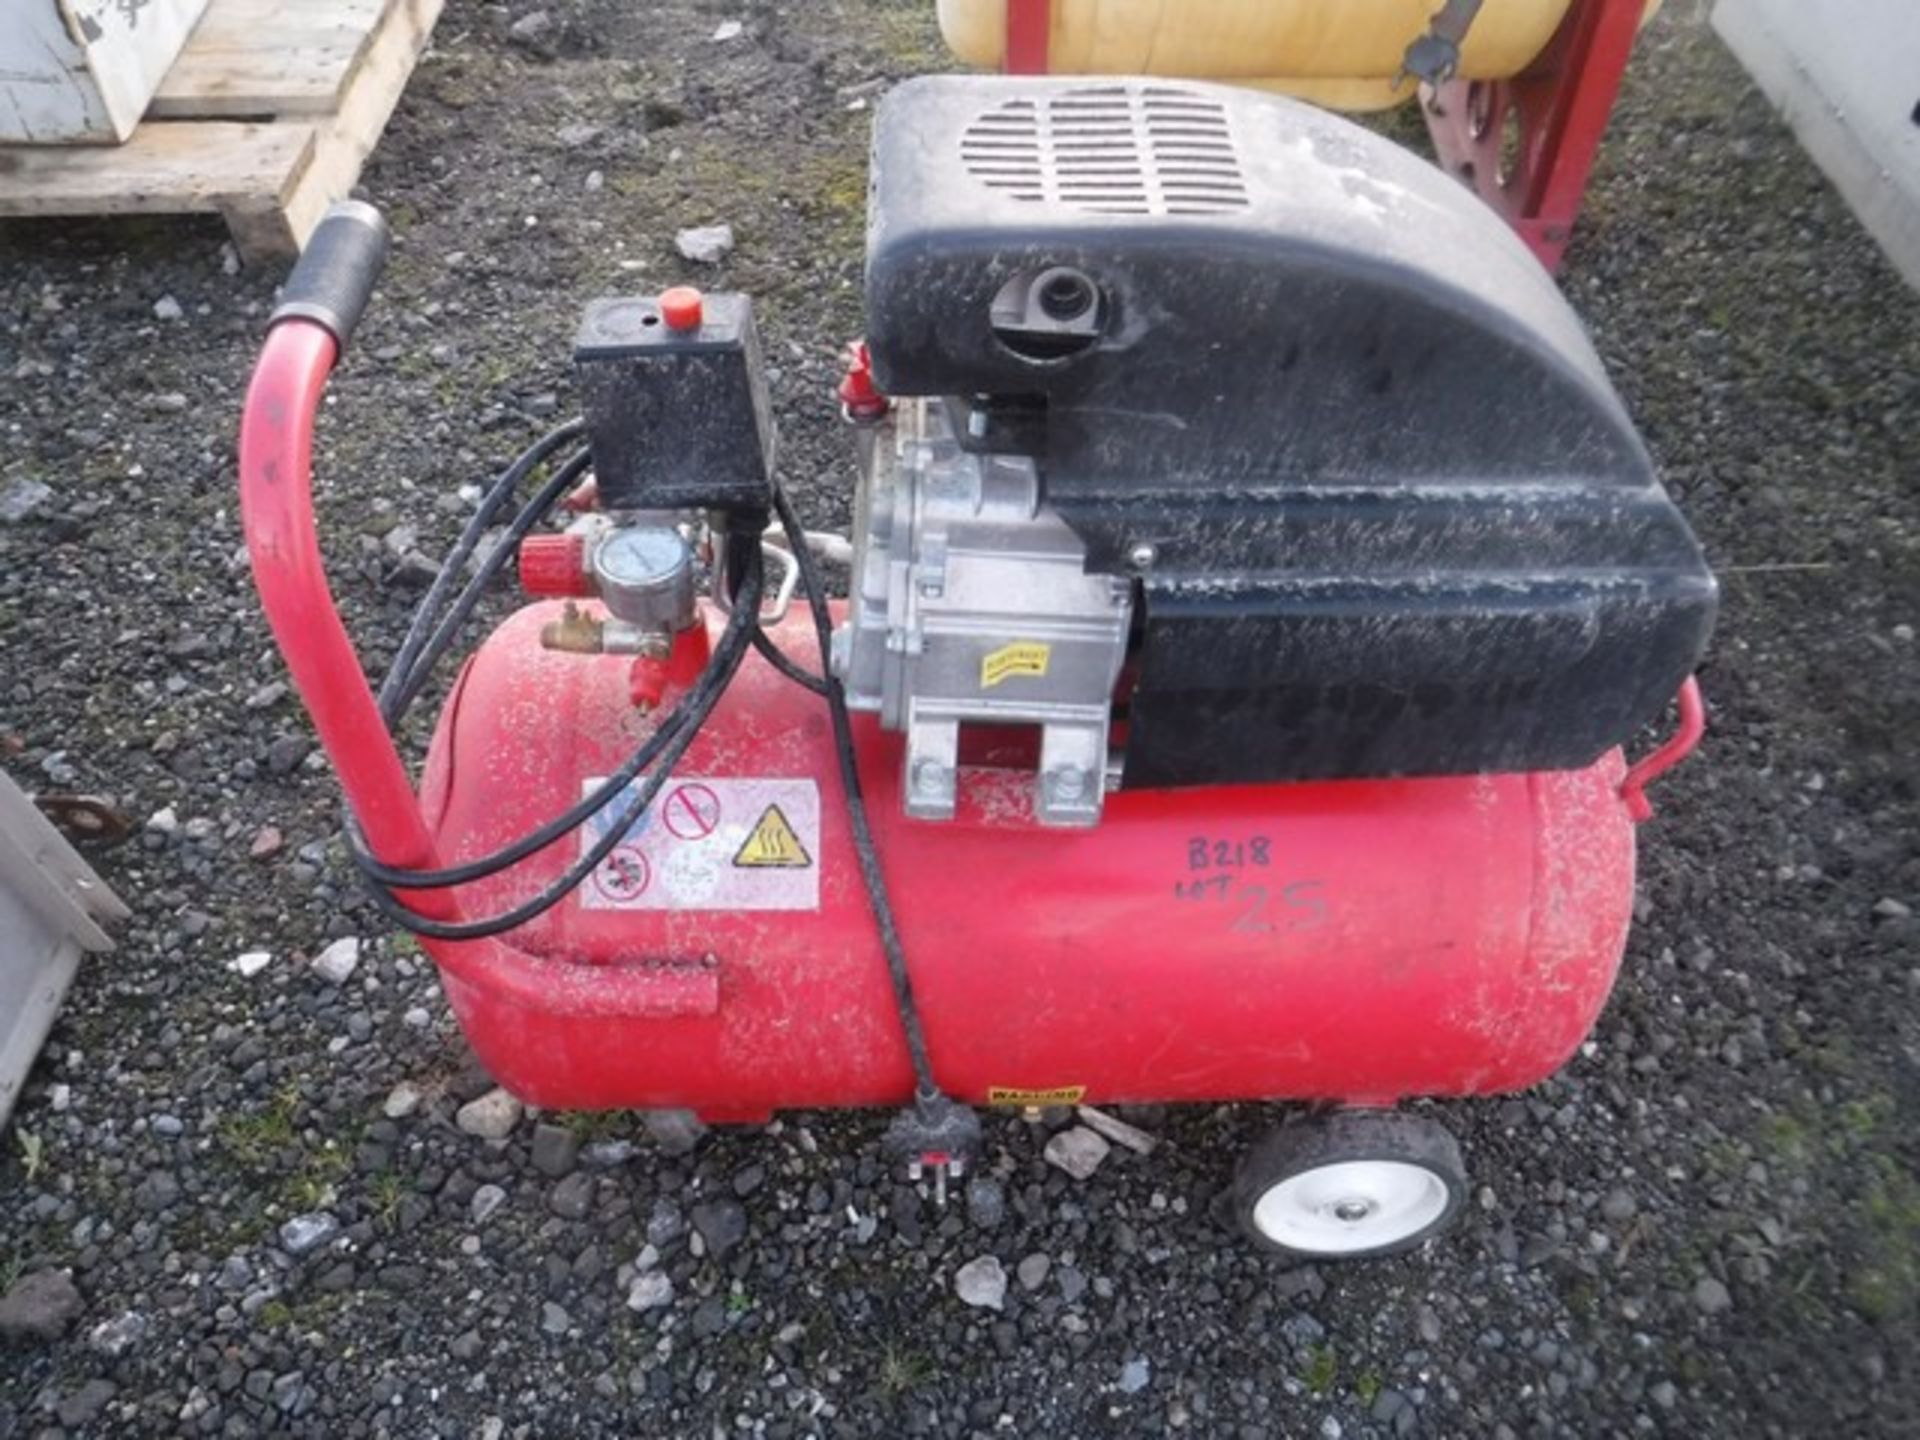 Auktionslos 25 - Air compressor. Spares or repairs